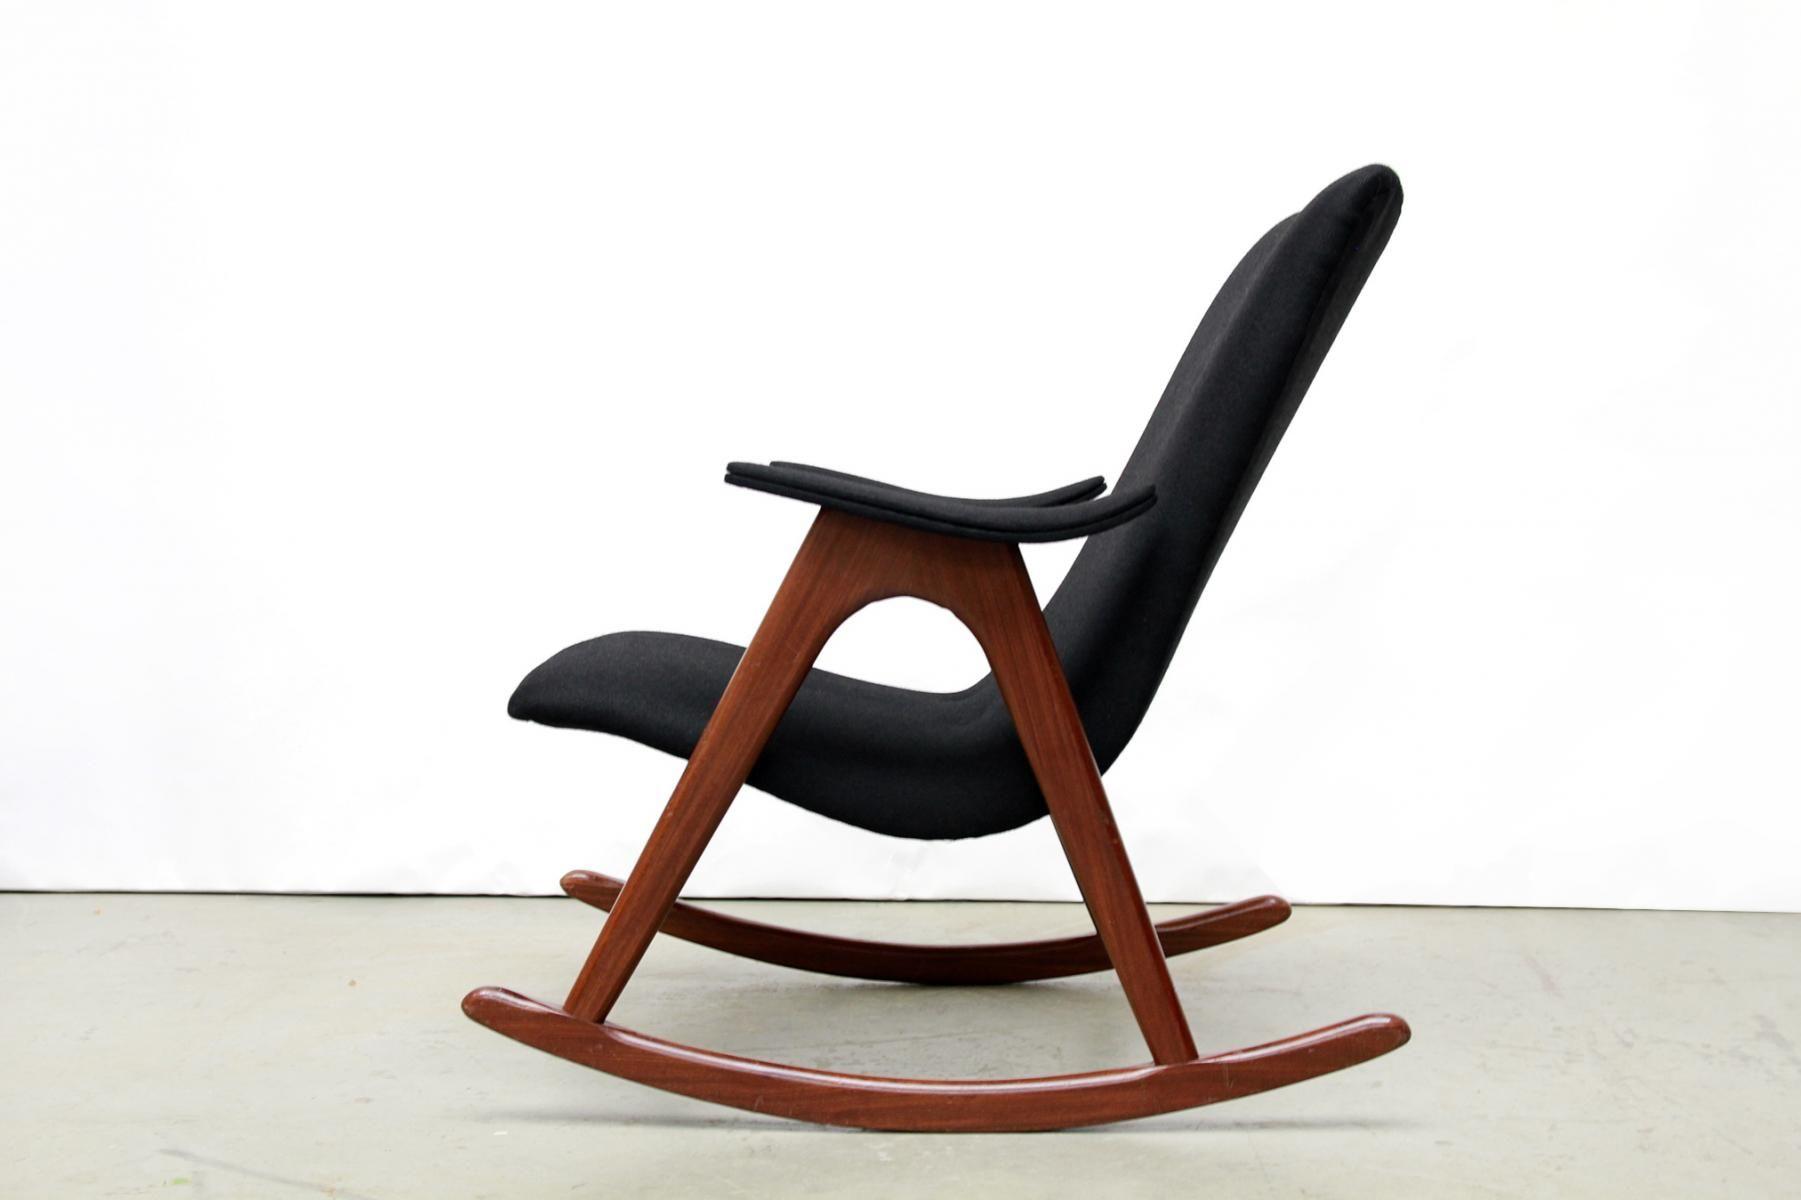 Dutch Mid-Century Rocking Chair by Louis van Teeffelen for WéBé, 1960s 2